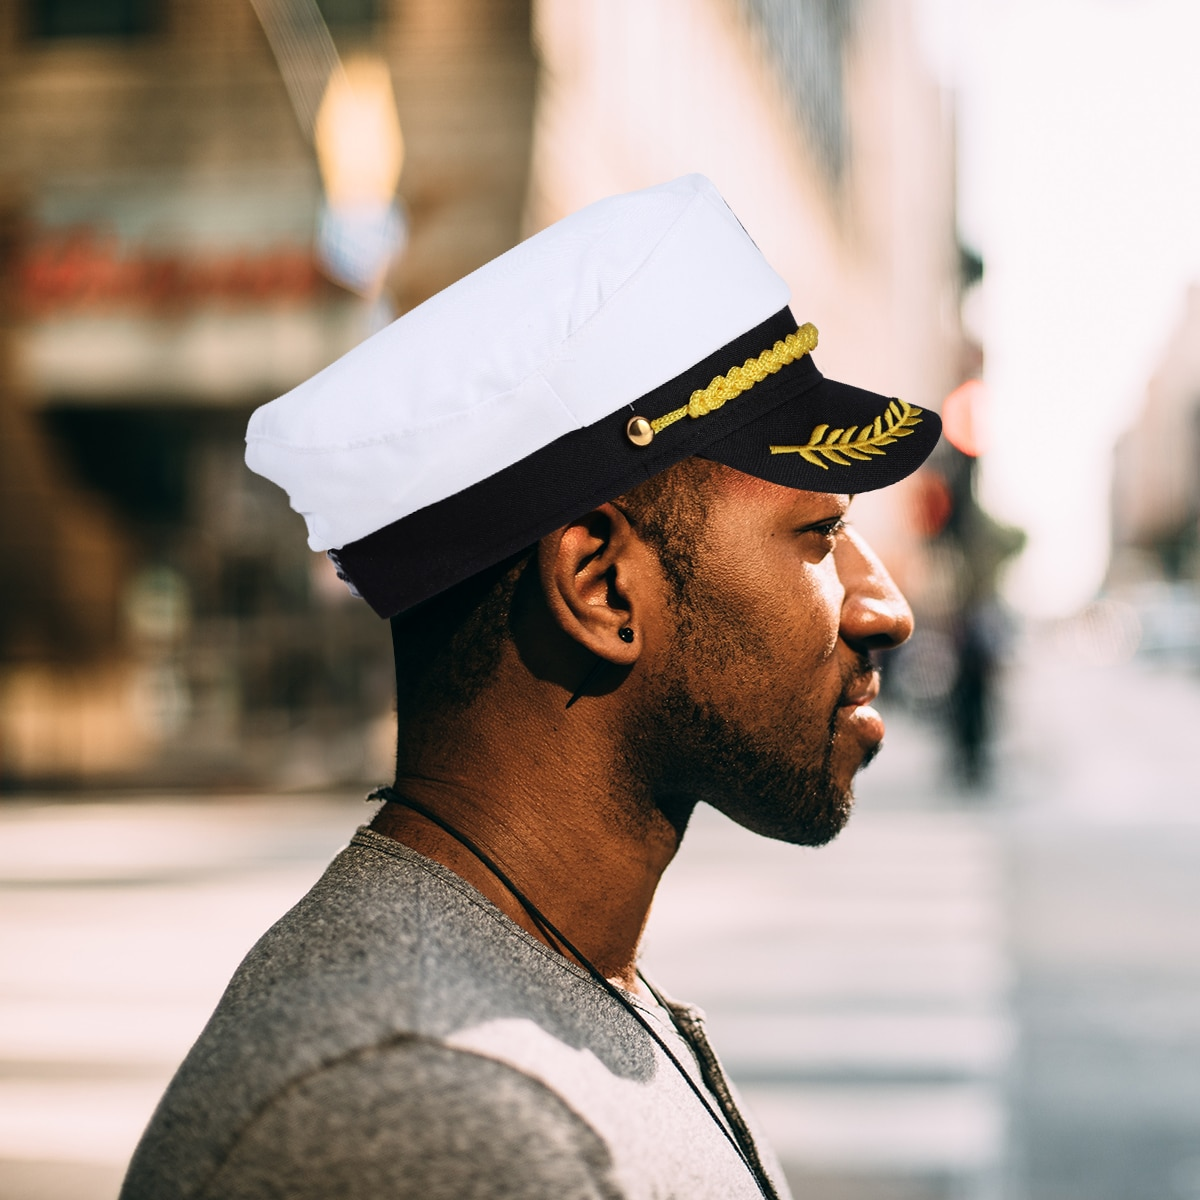 navy emporium uss sand lance ssn 660 framed navy ship display Adult Captain Hat Military Hats Boat Skipper Ship Sailor Costume Hat Adjustable Cap Navy Marine Admiral for Men Women